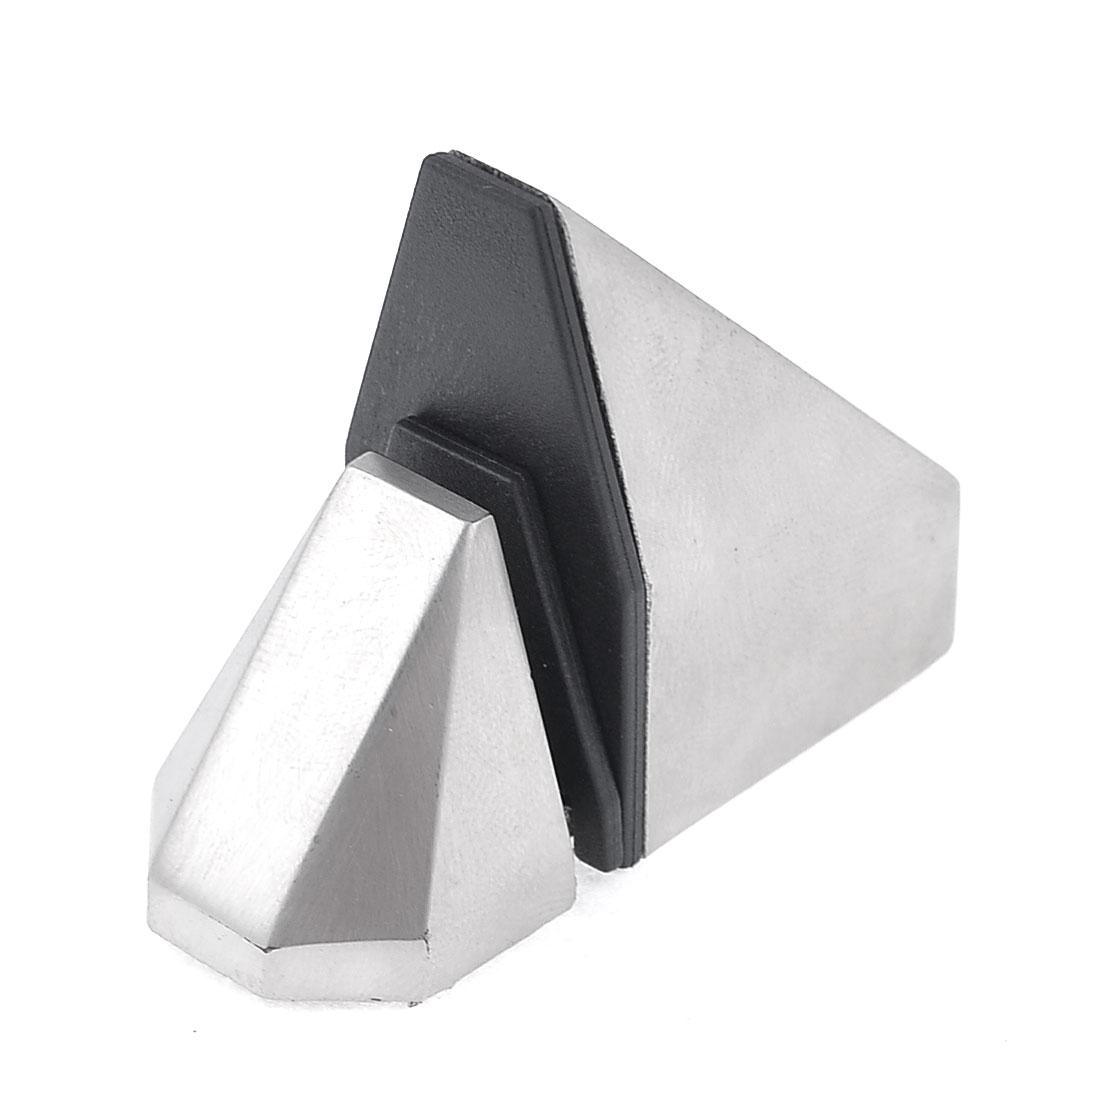 4.2mm Mounted Hole Dia Elbow Shape Glass Shelf Clamp Holder Bracket Silver Tone